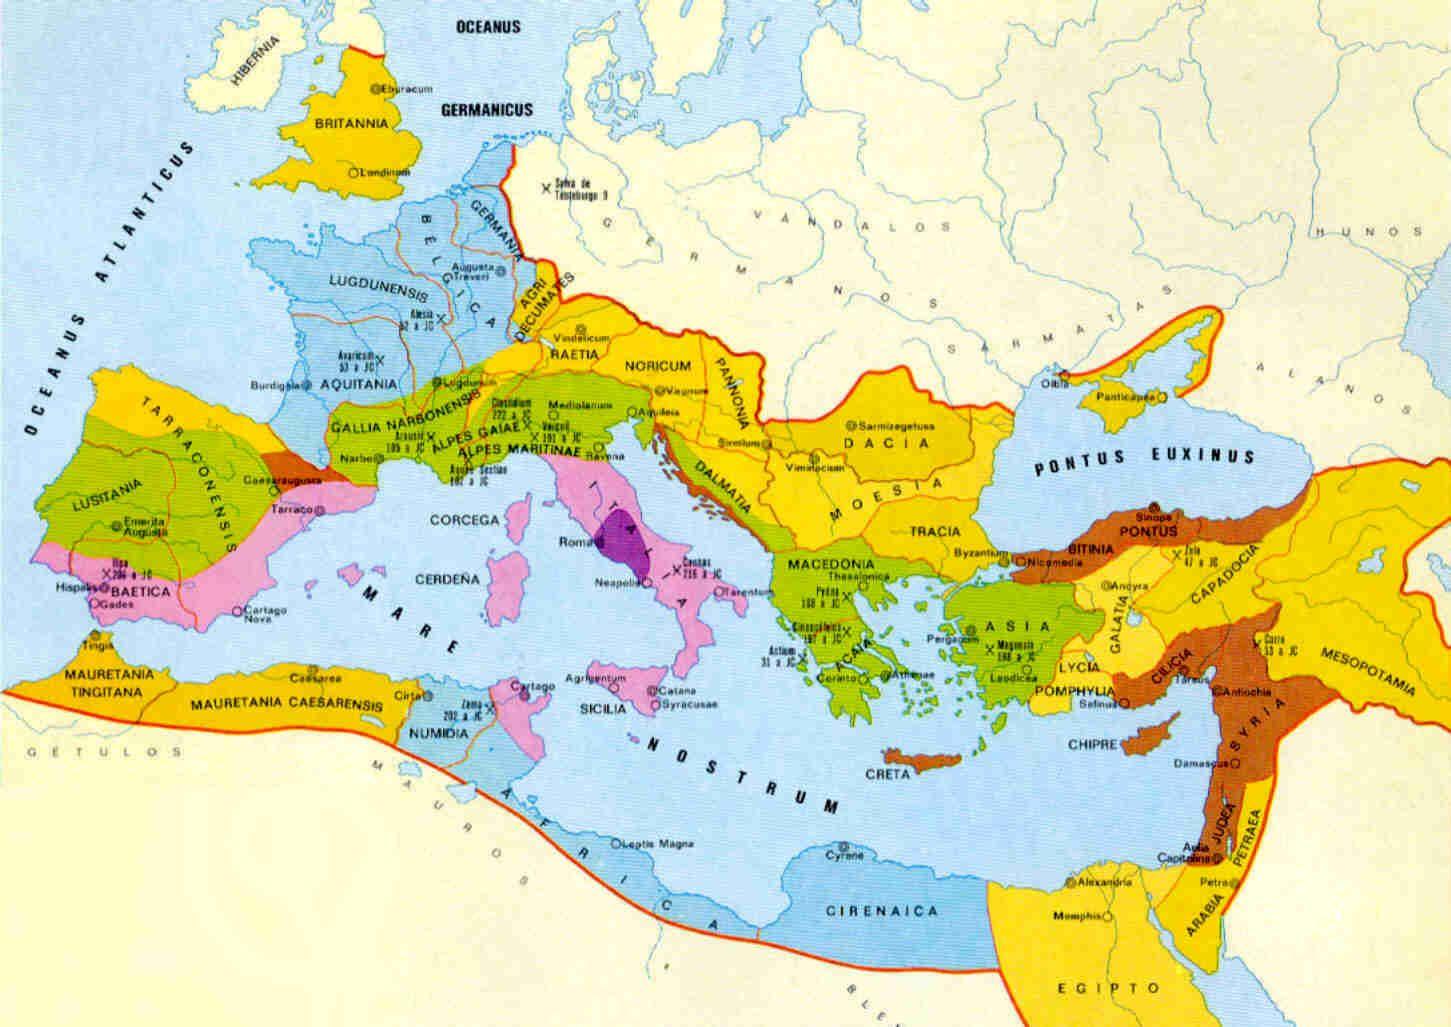 mapa de roma Mapa de Roma Imperial en su máximo apogeo | the world around us  mapa de roma